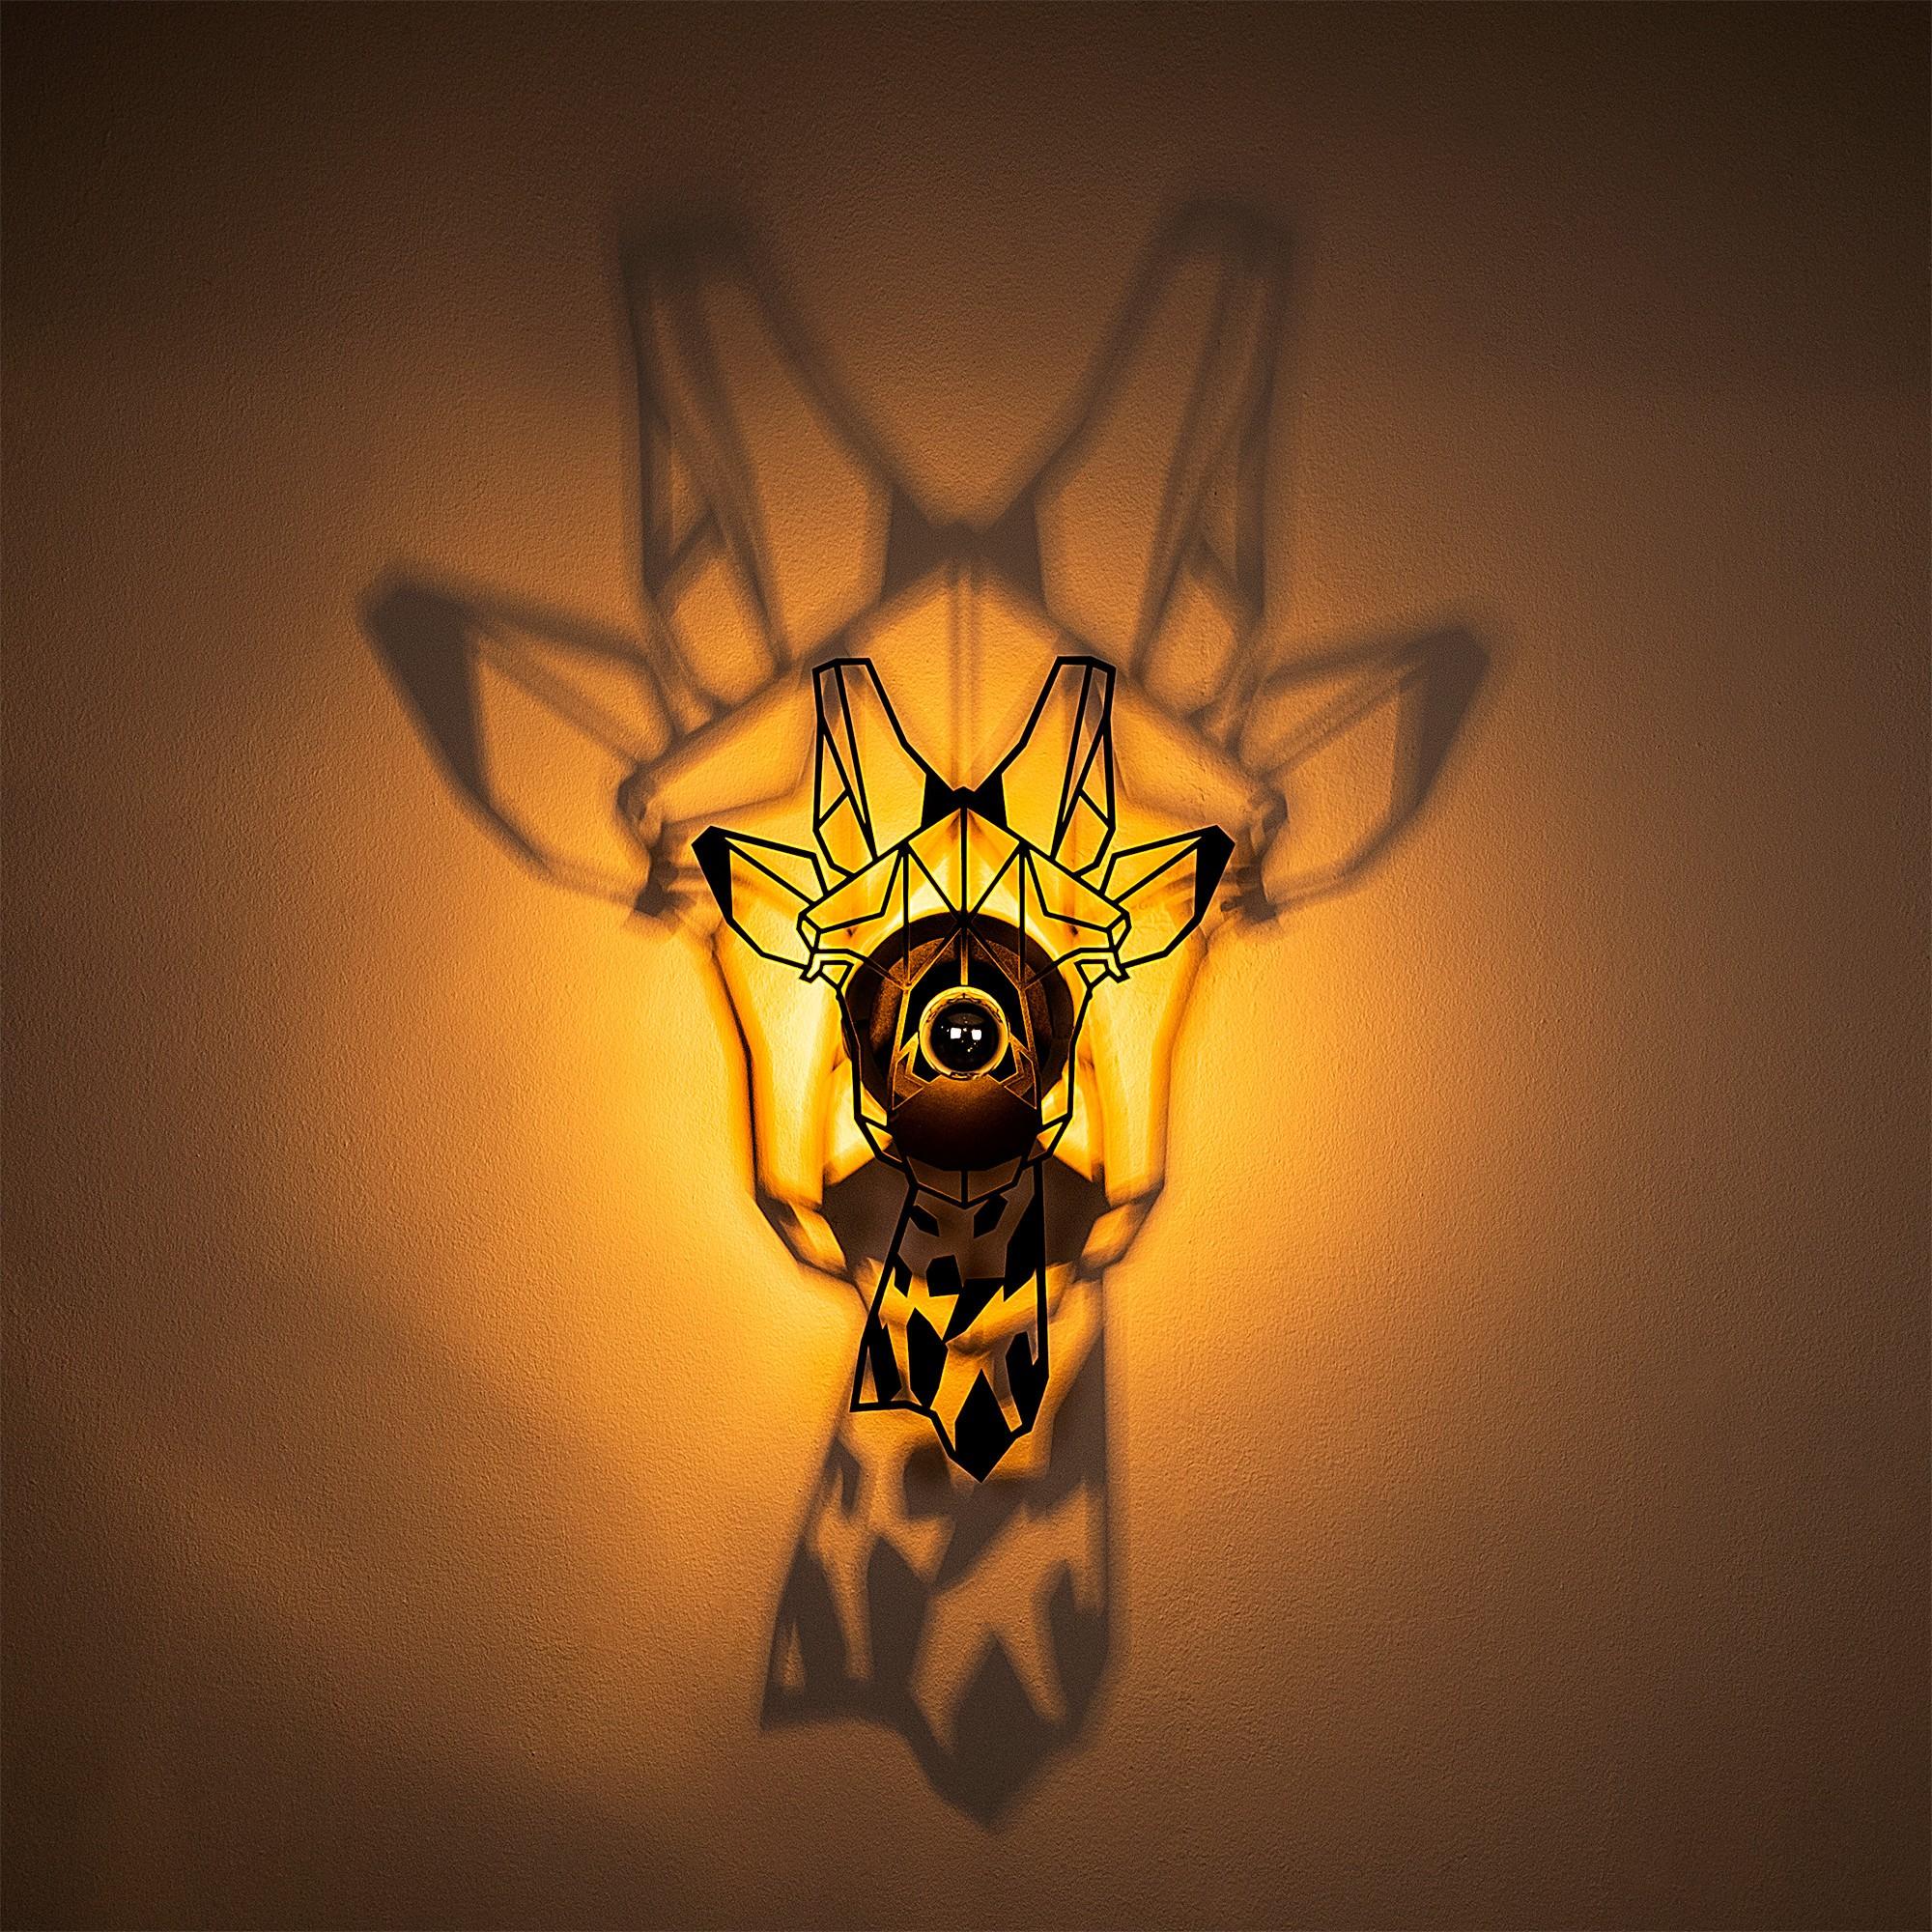 LED industriële wanddeco lamp dieren - Giraf - dimbaar - E27 fitting - Sfeerfoto incl. lamp warm wit